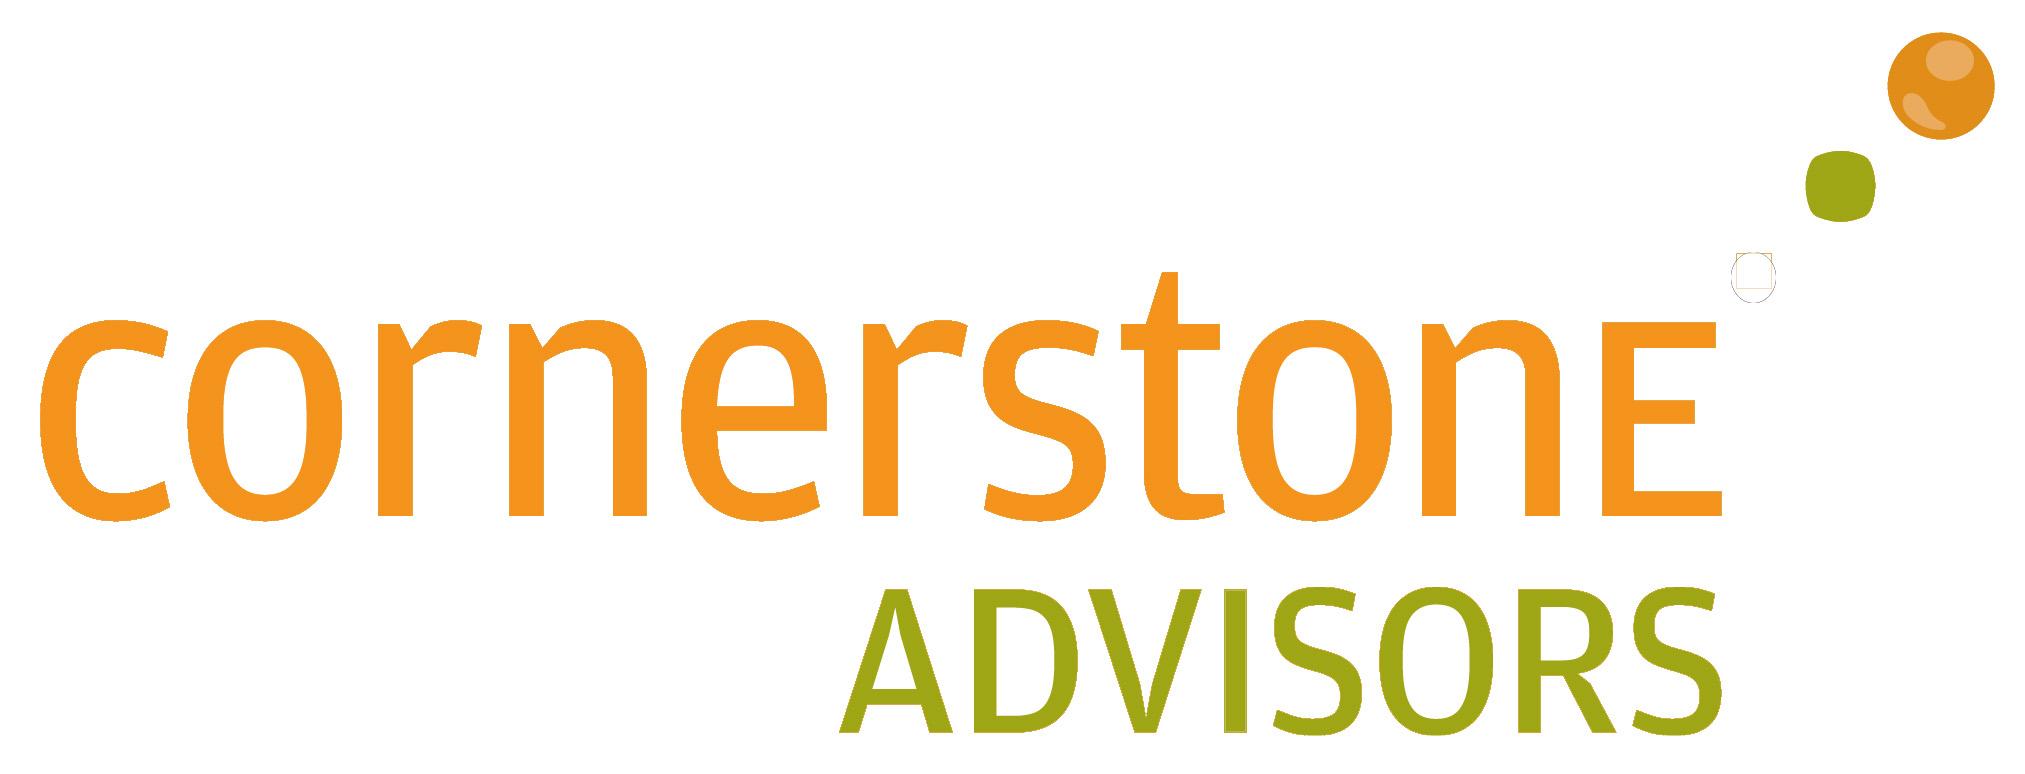 Cornerstone Logo-Advisors.jpg